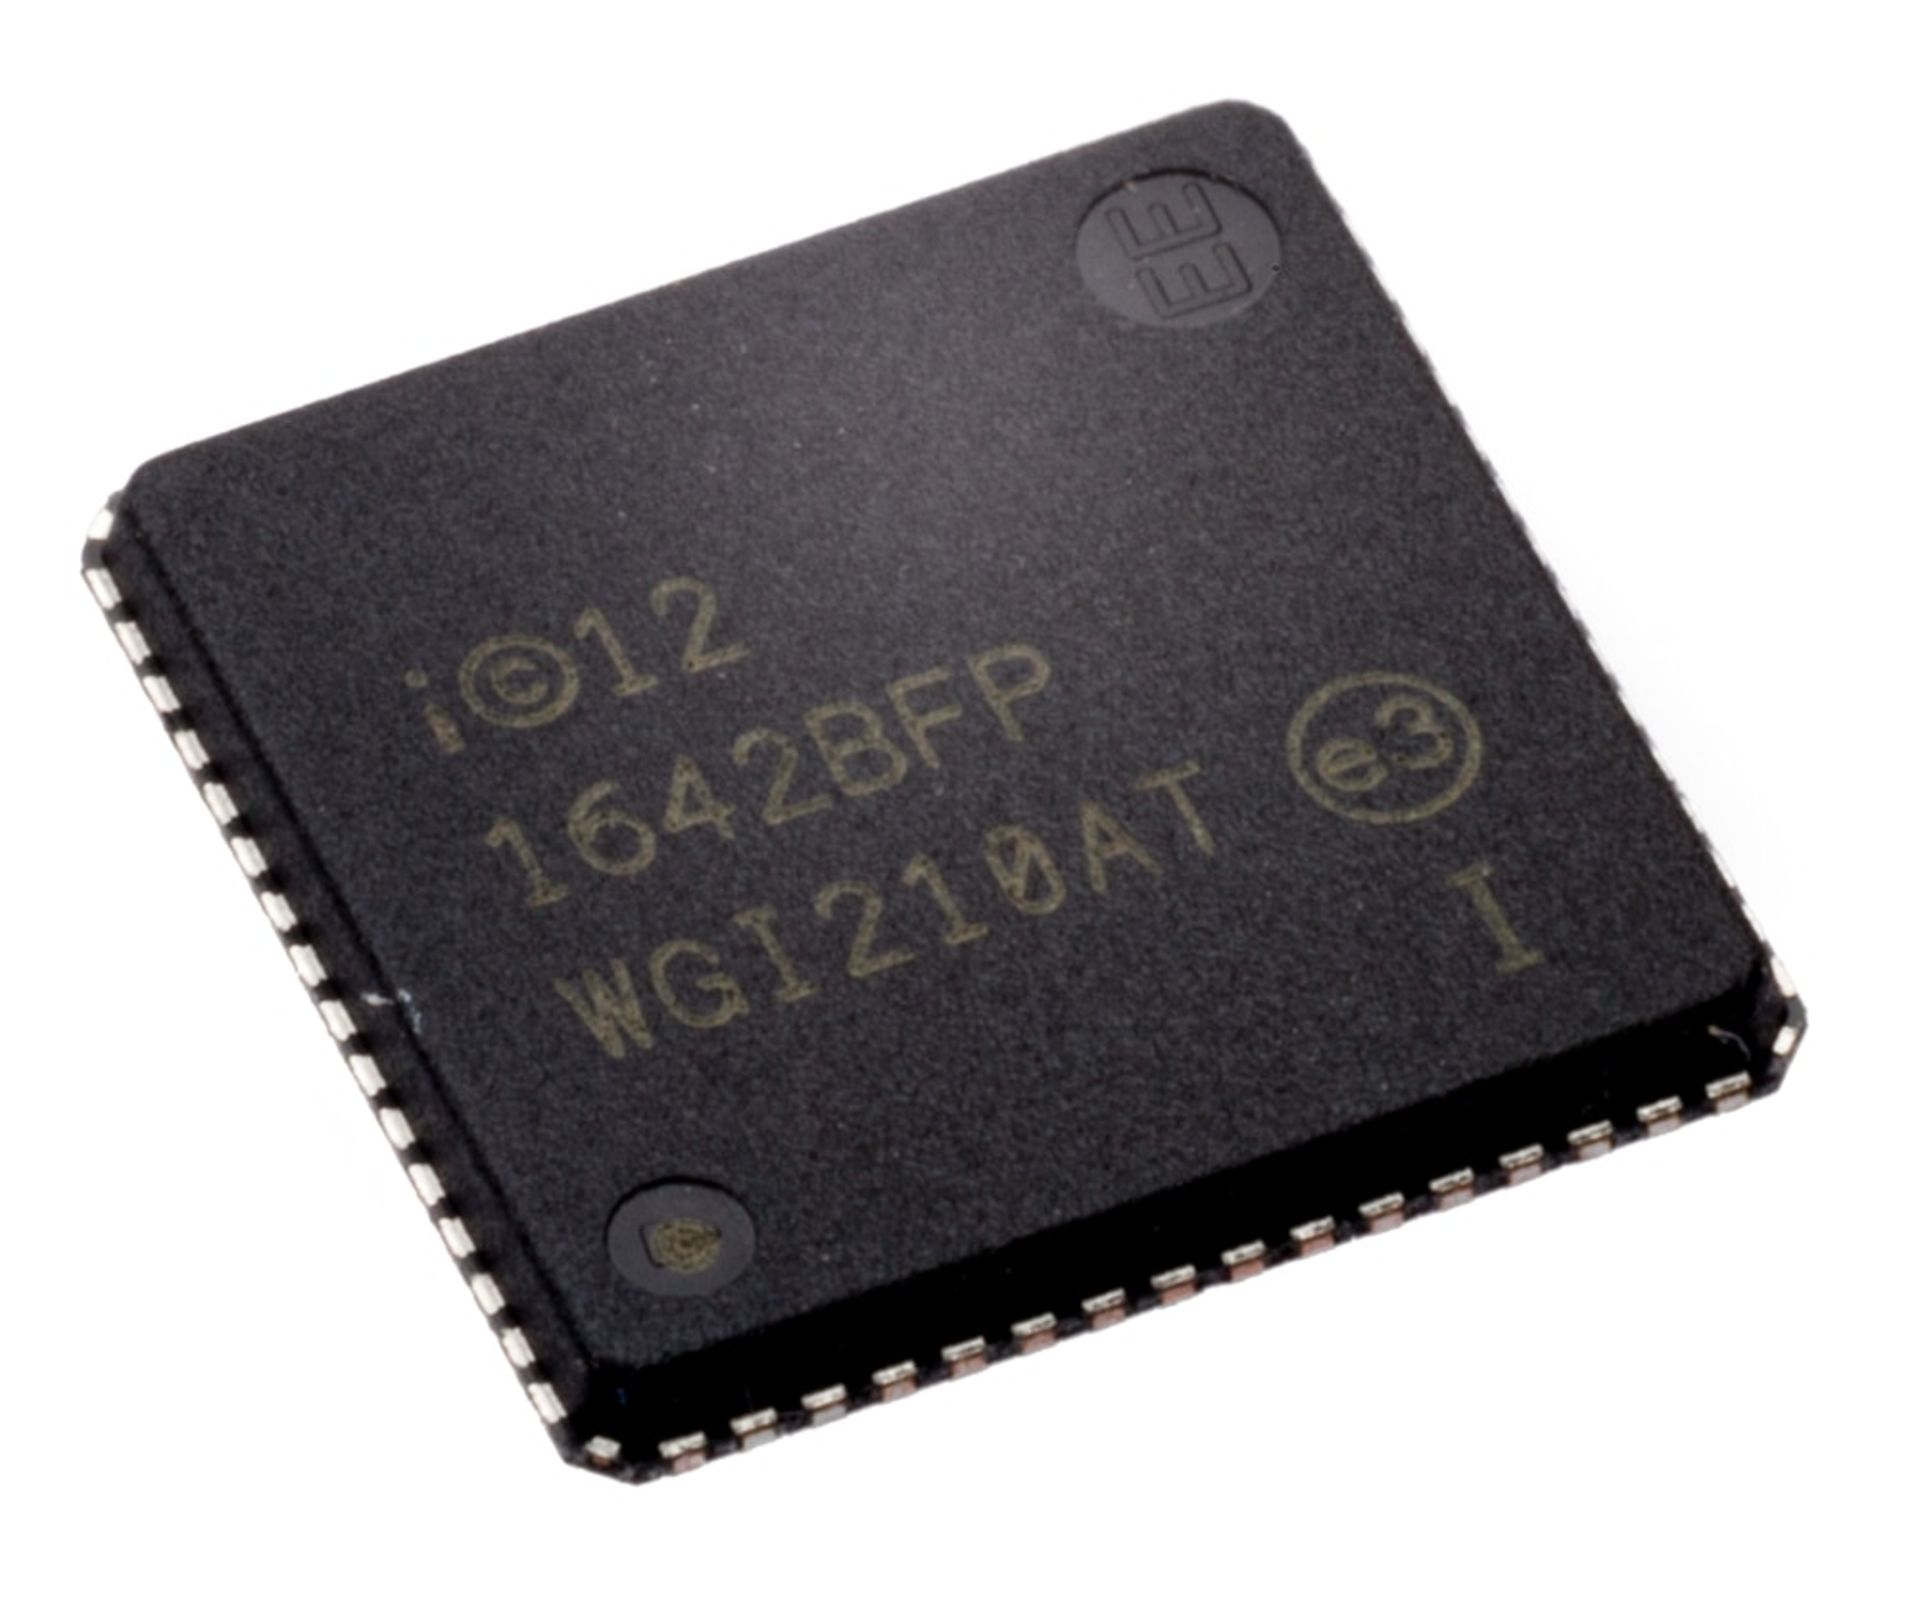 Intel WGI210IT S LJXT, Ethernet CTLR Single Chip 10Mbps/100Mbps/1000Mbps 3.3V Automotive 64-Pin